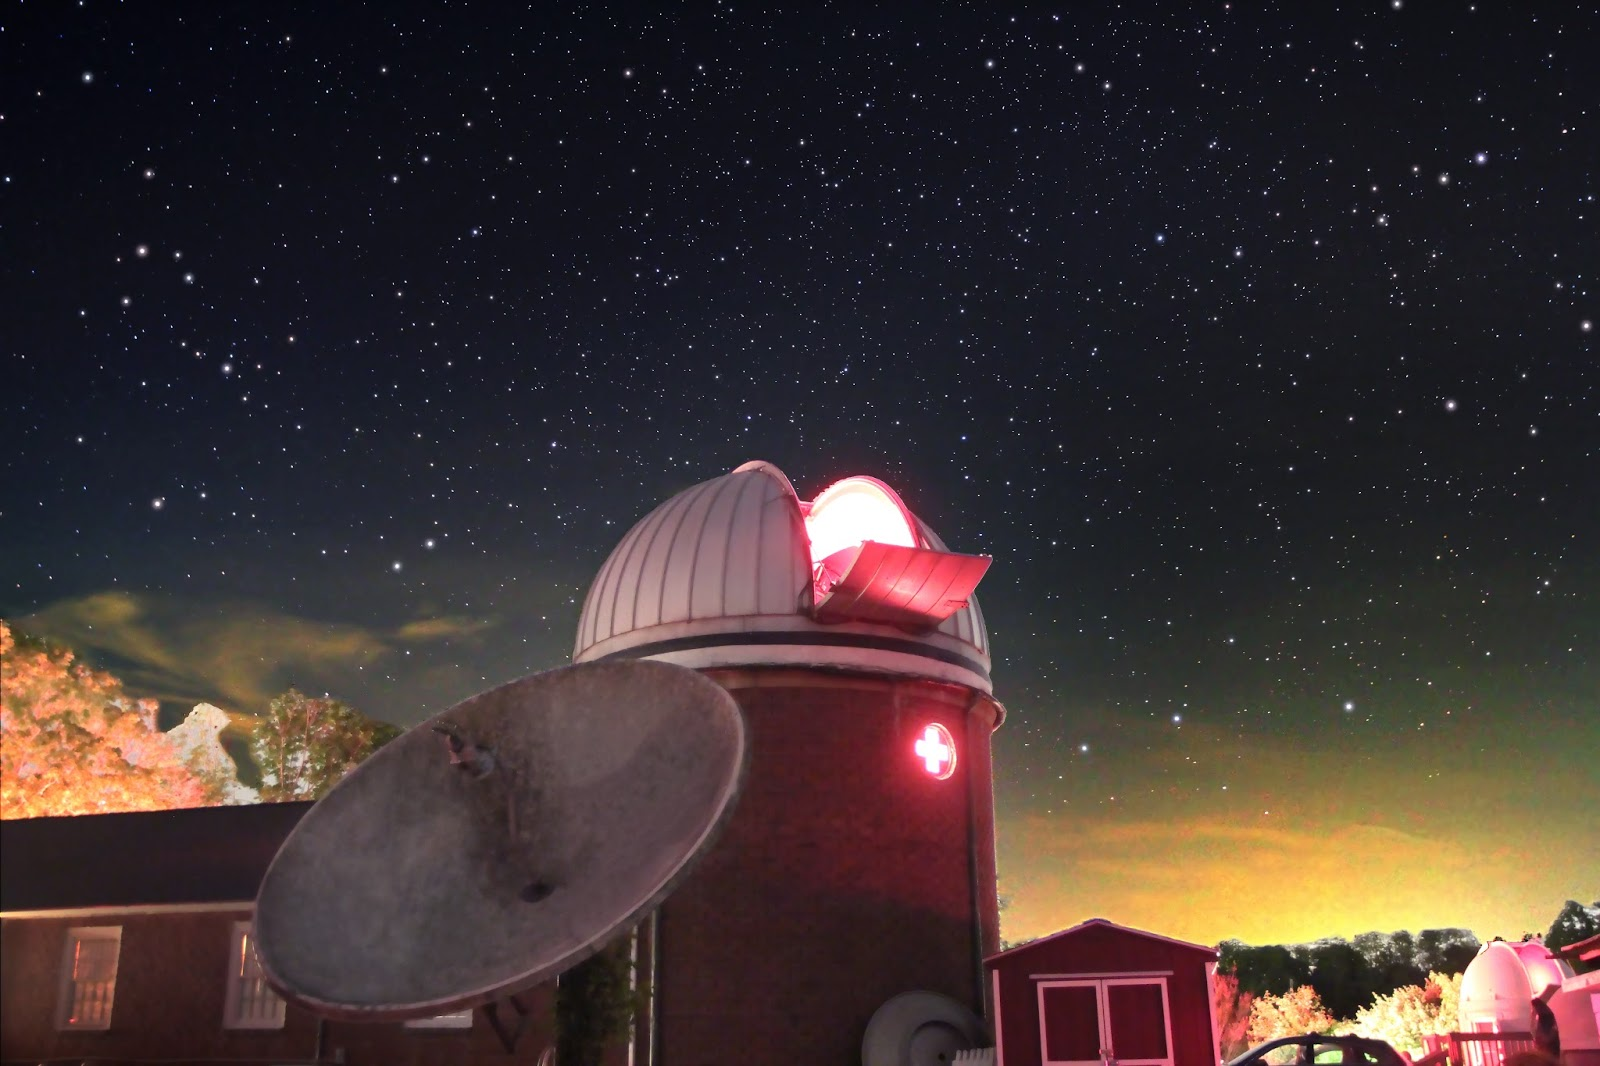 astronomy observatory - photo #16